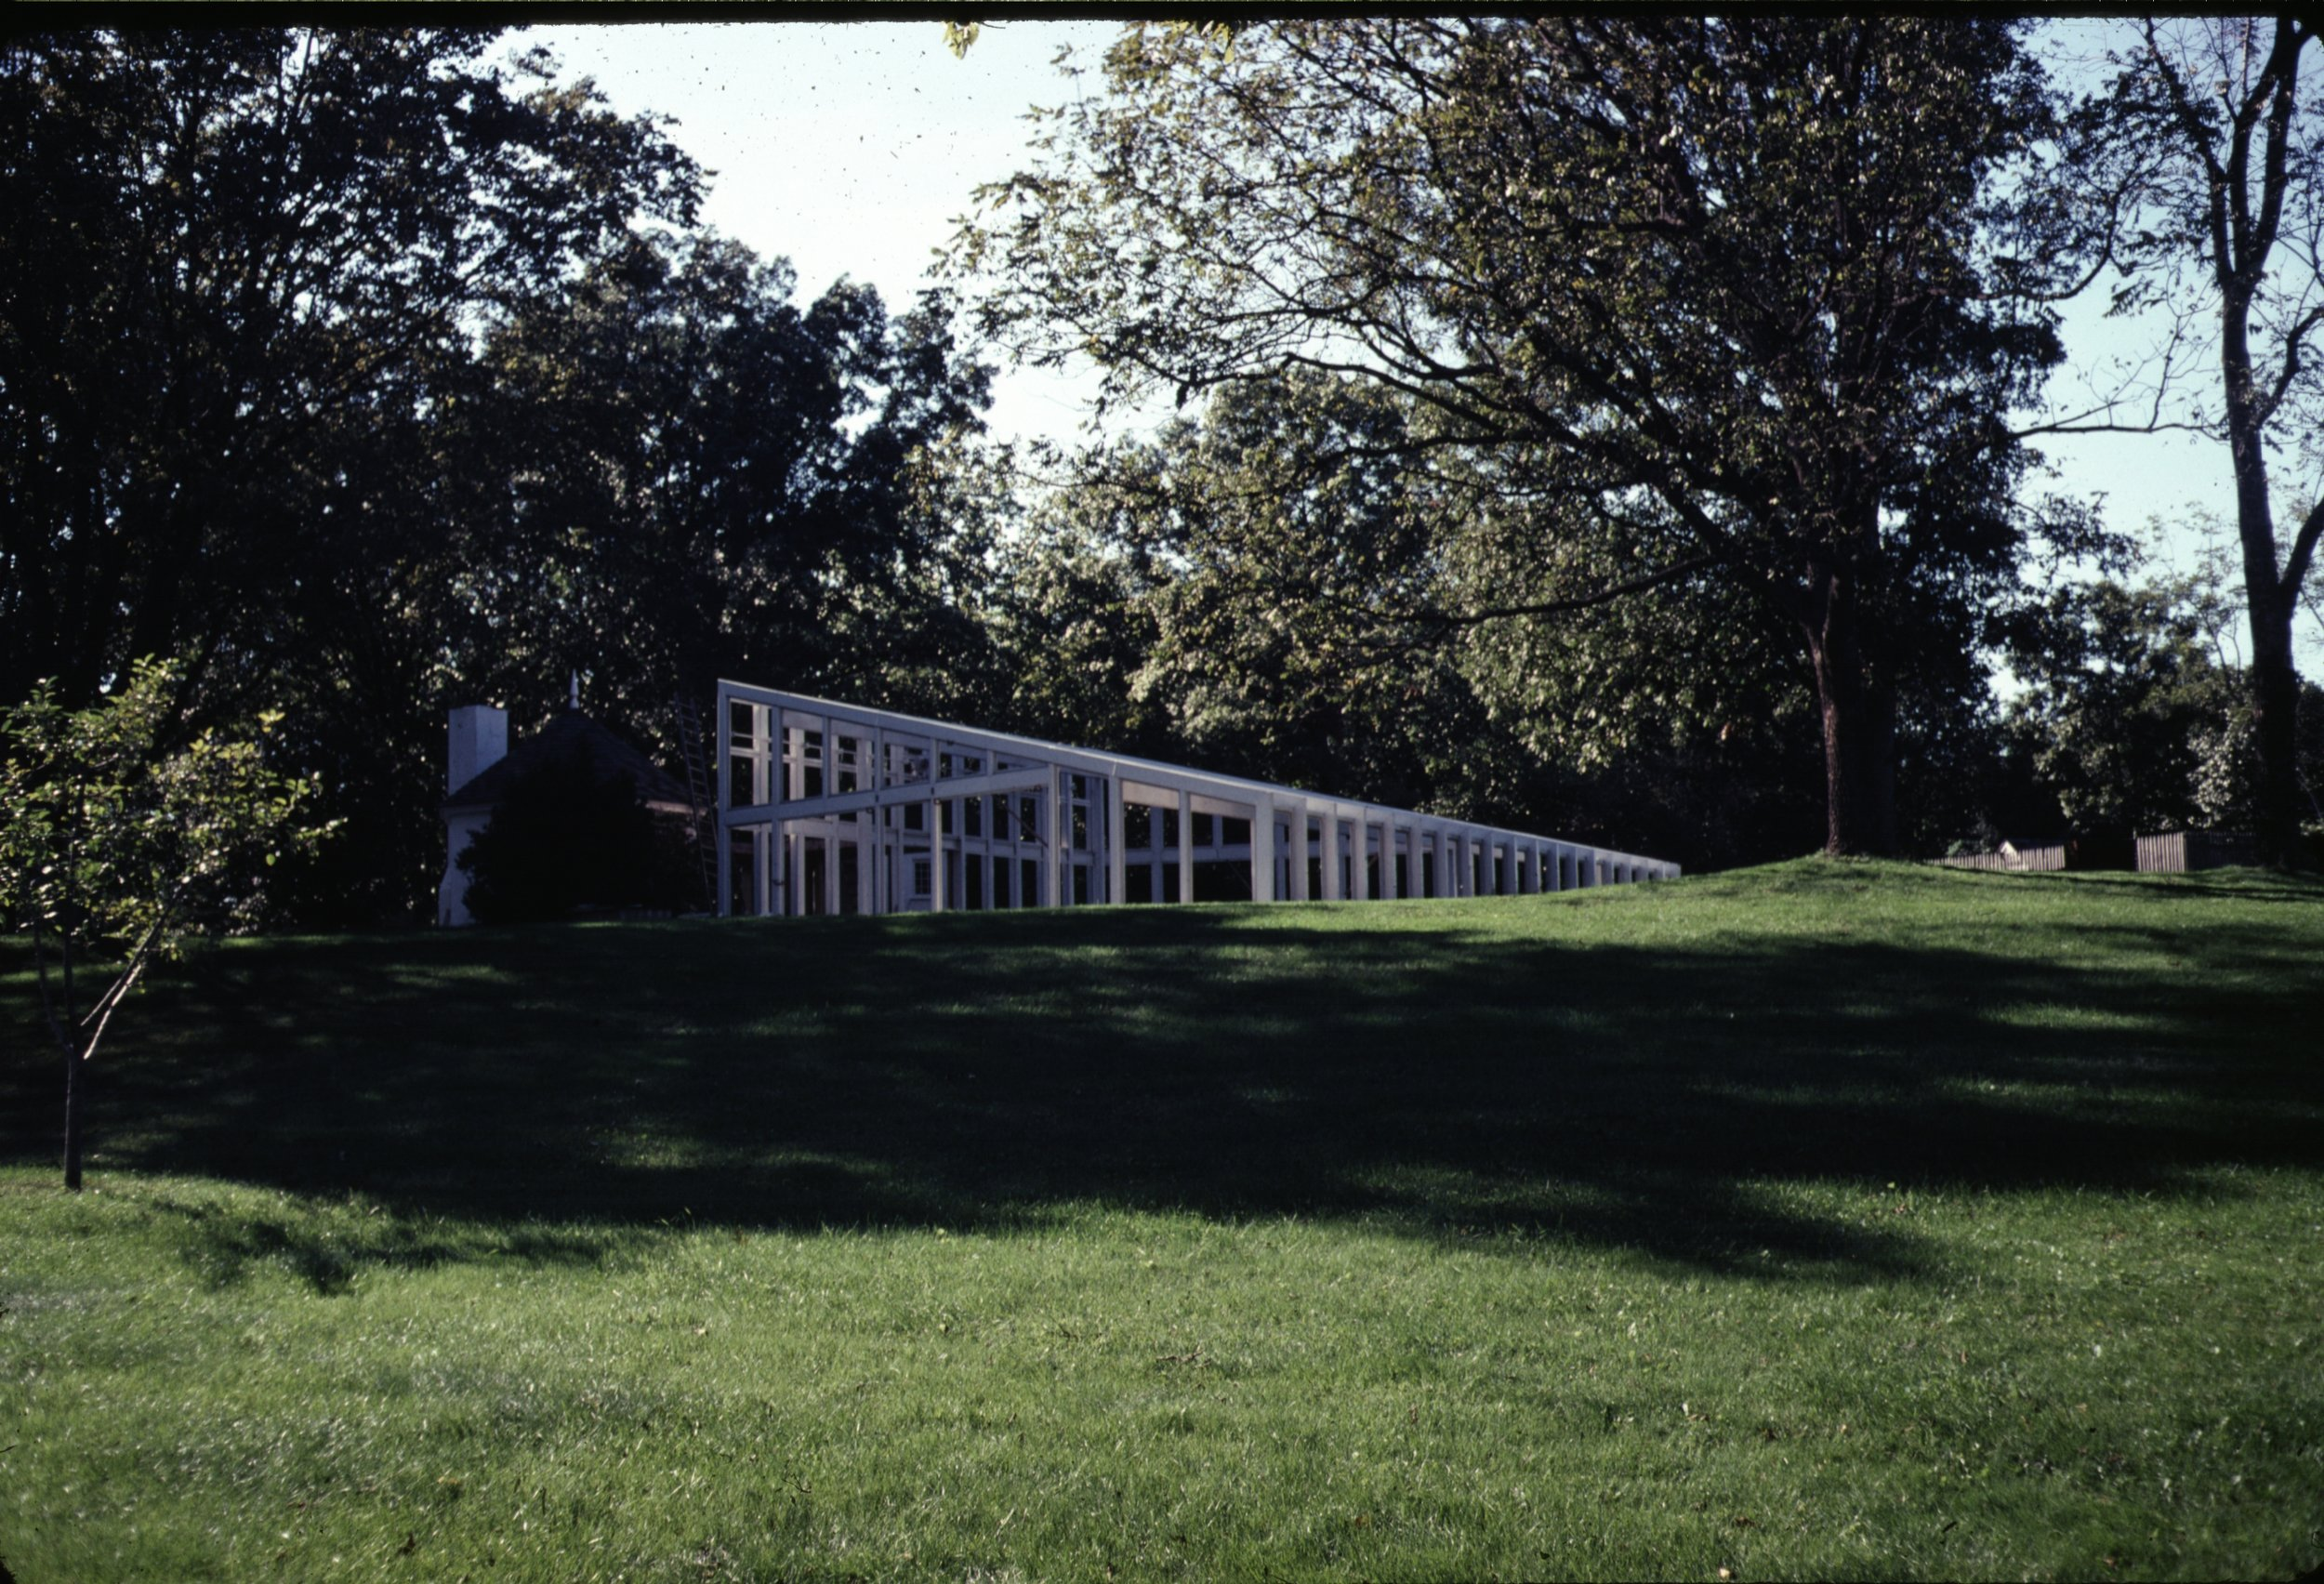 The Mellon Pool House